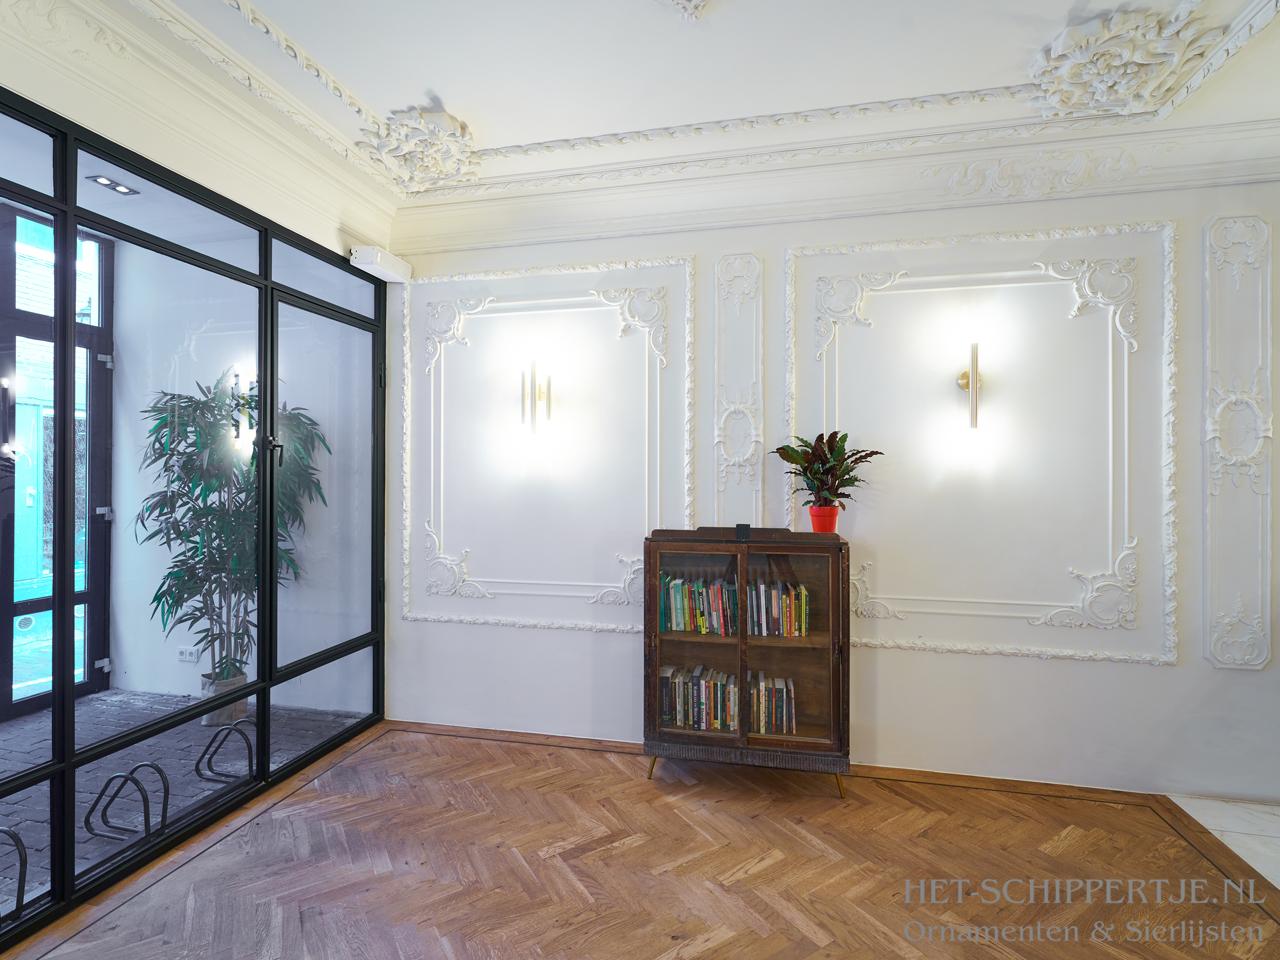 plafonddecoratie